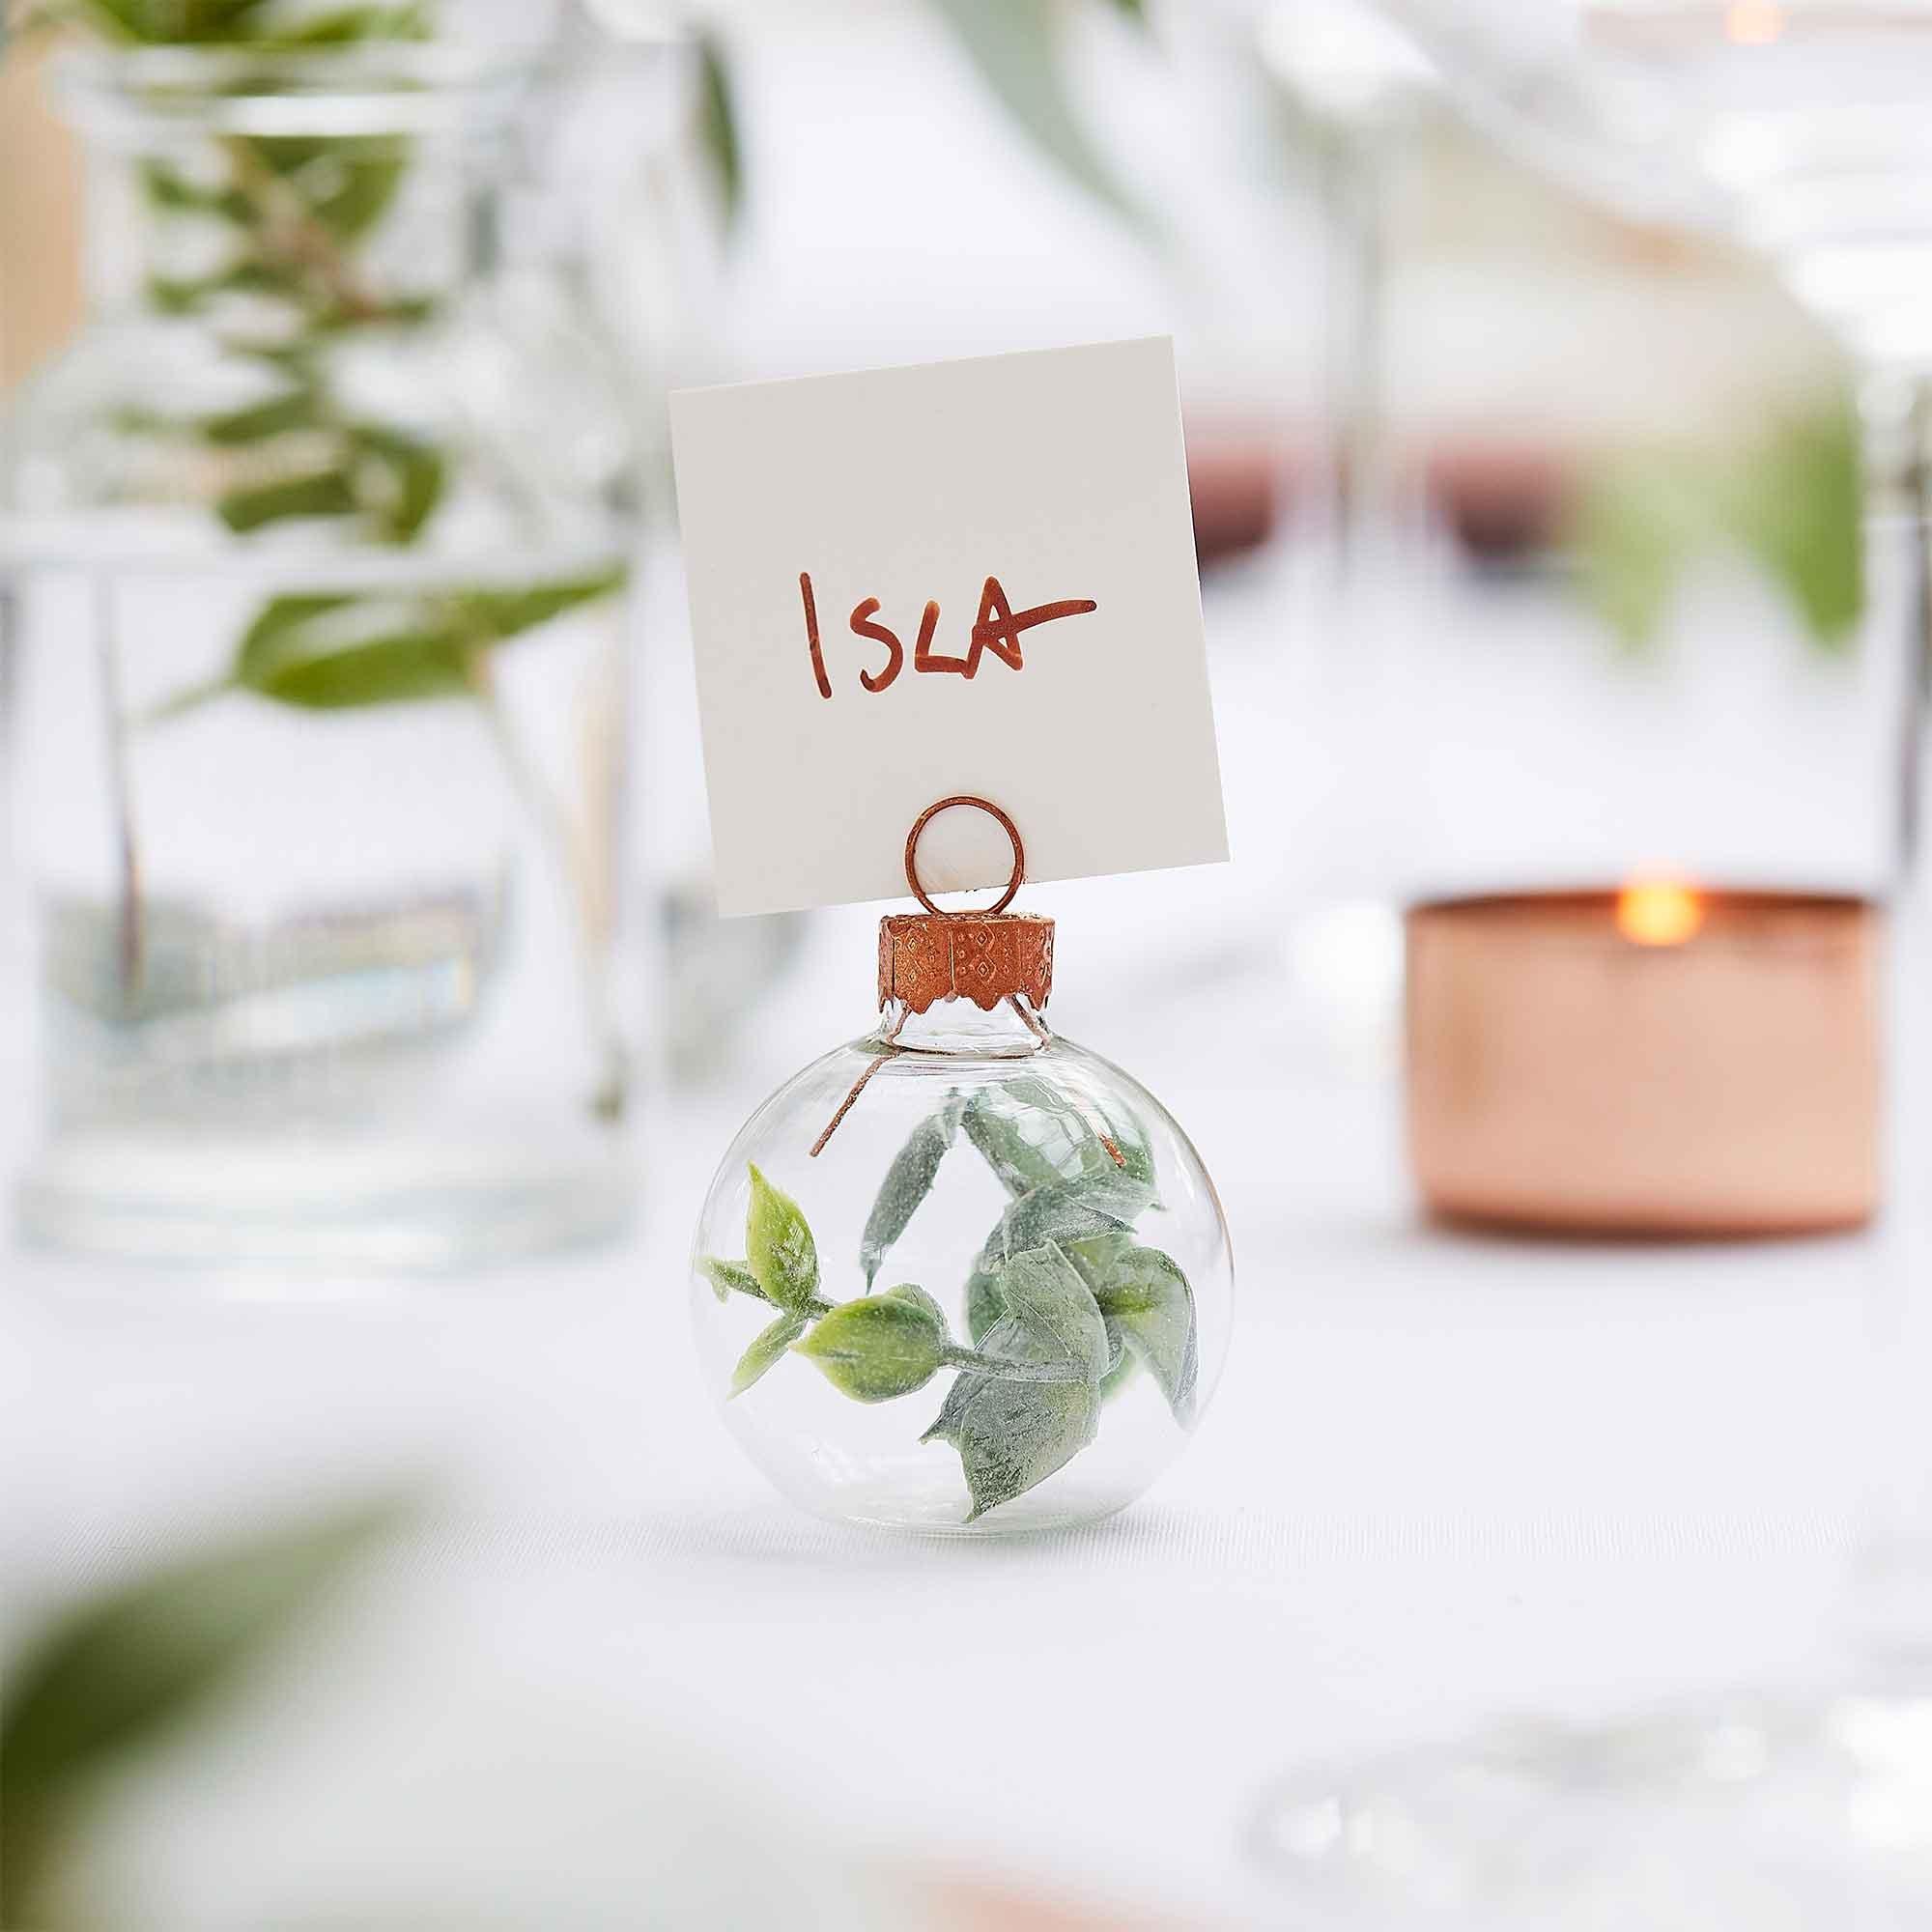 Botanical Wedding Eucalyptus Bauble Place Card Holder With White Place Cards